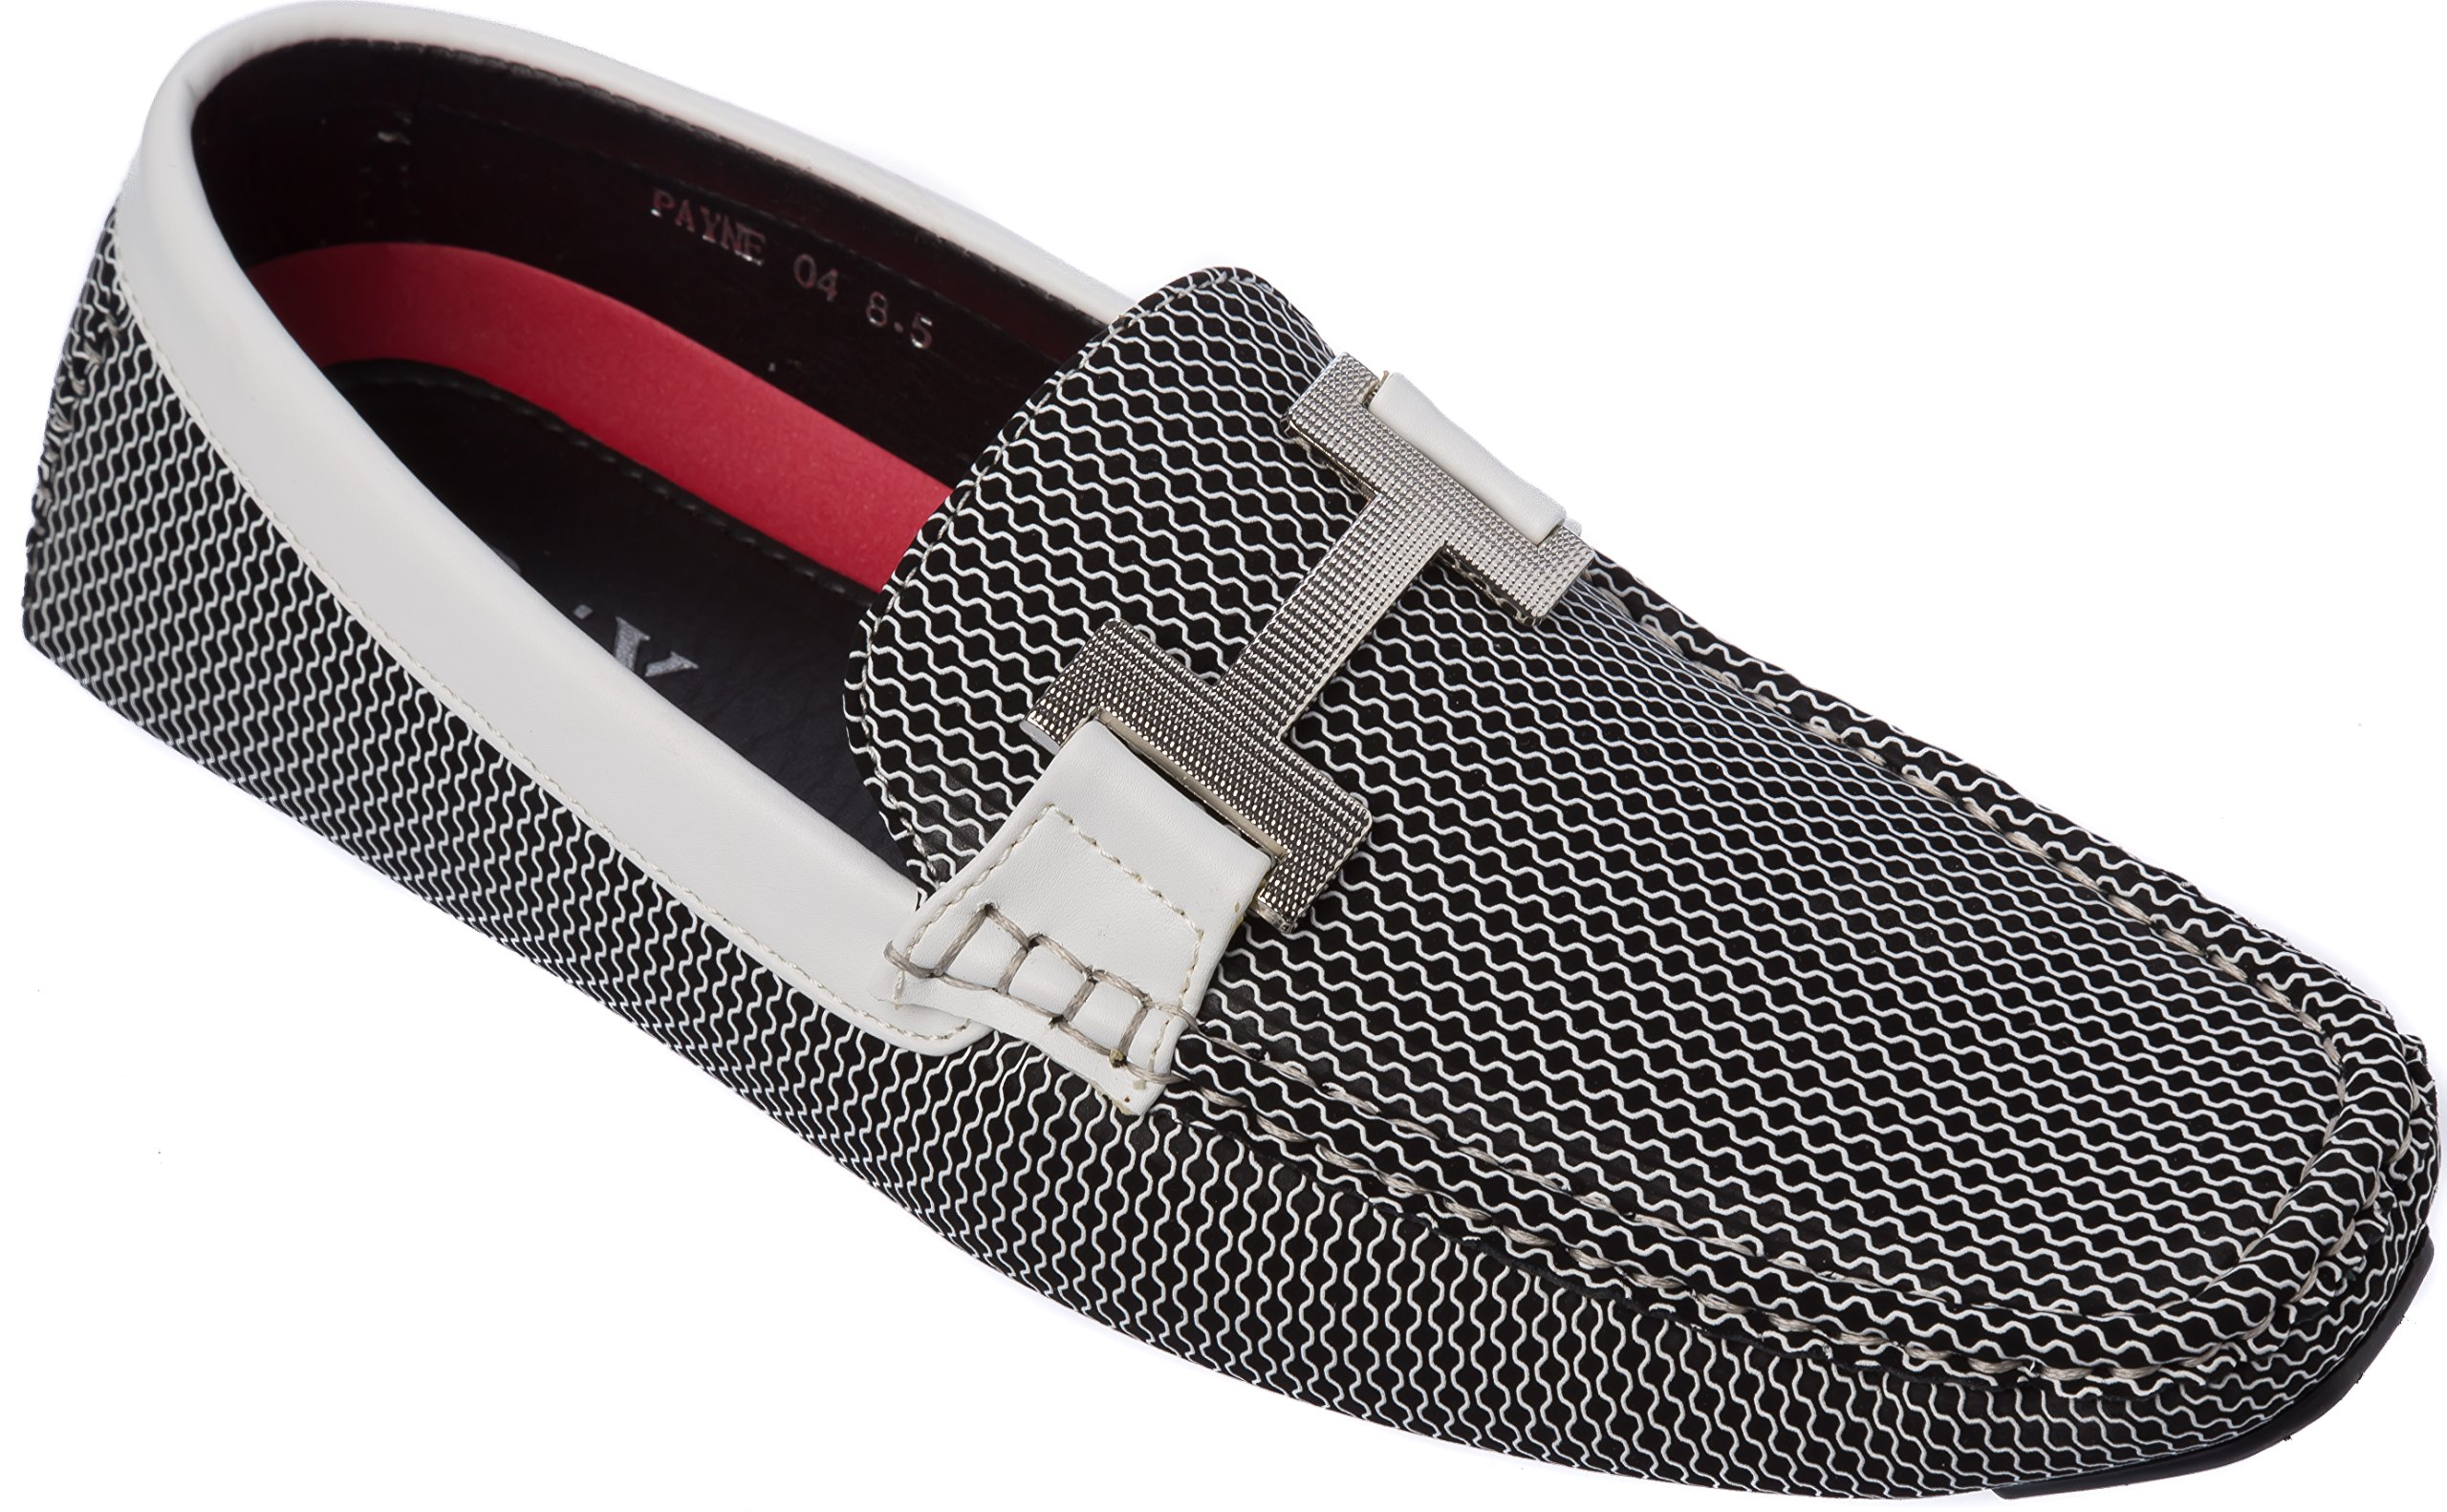 Brix Mens Slip-On Fashion-Loafer White Shoes Size 8.5